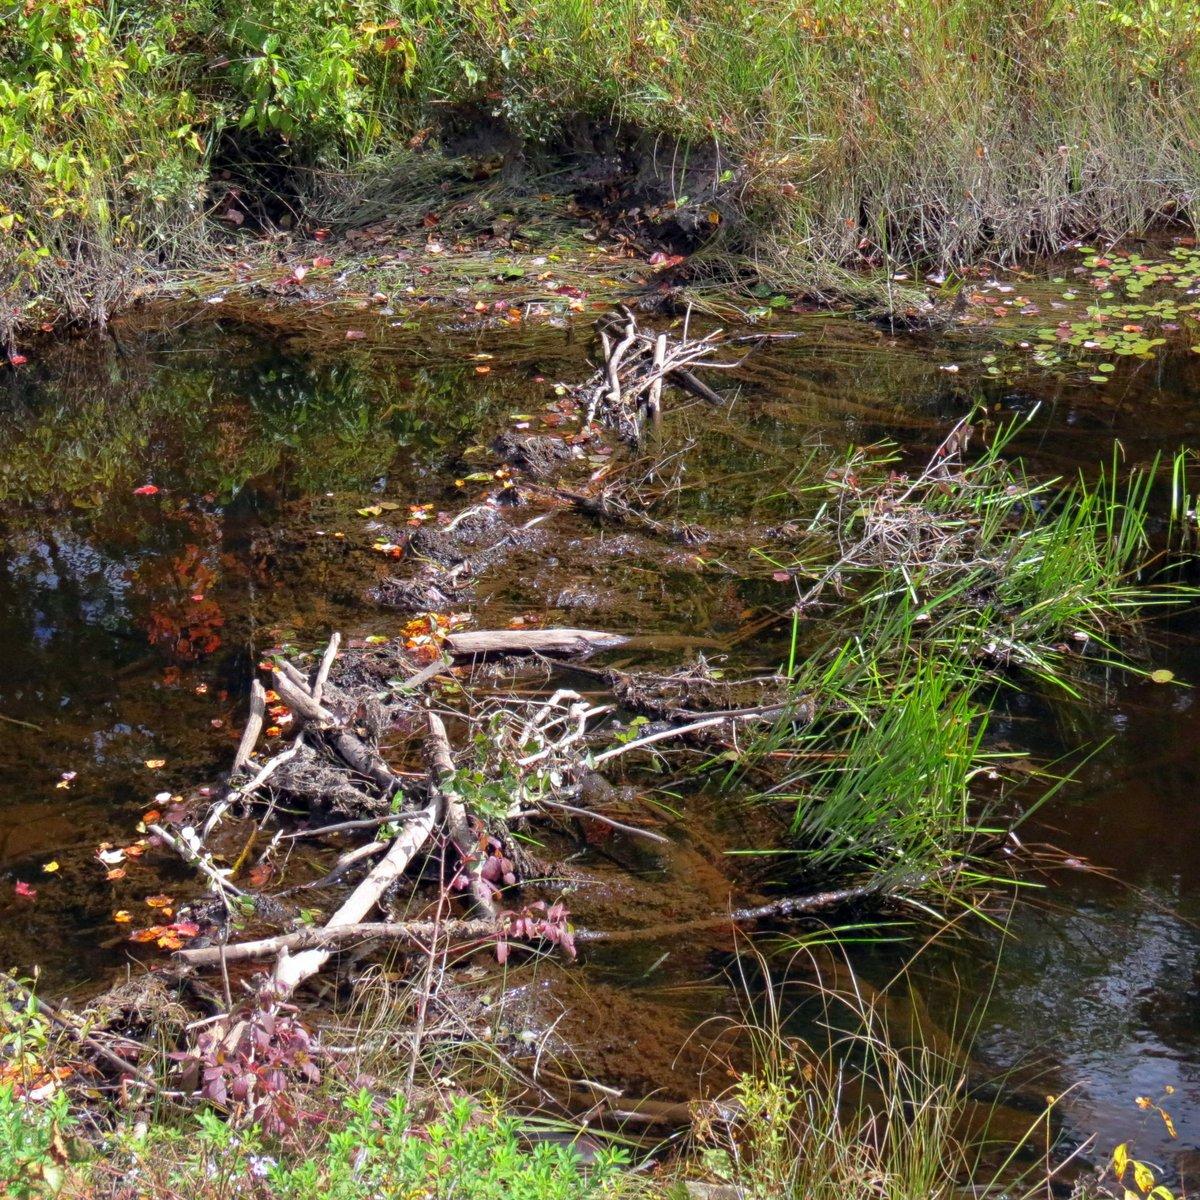 15. Beaver Dam